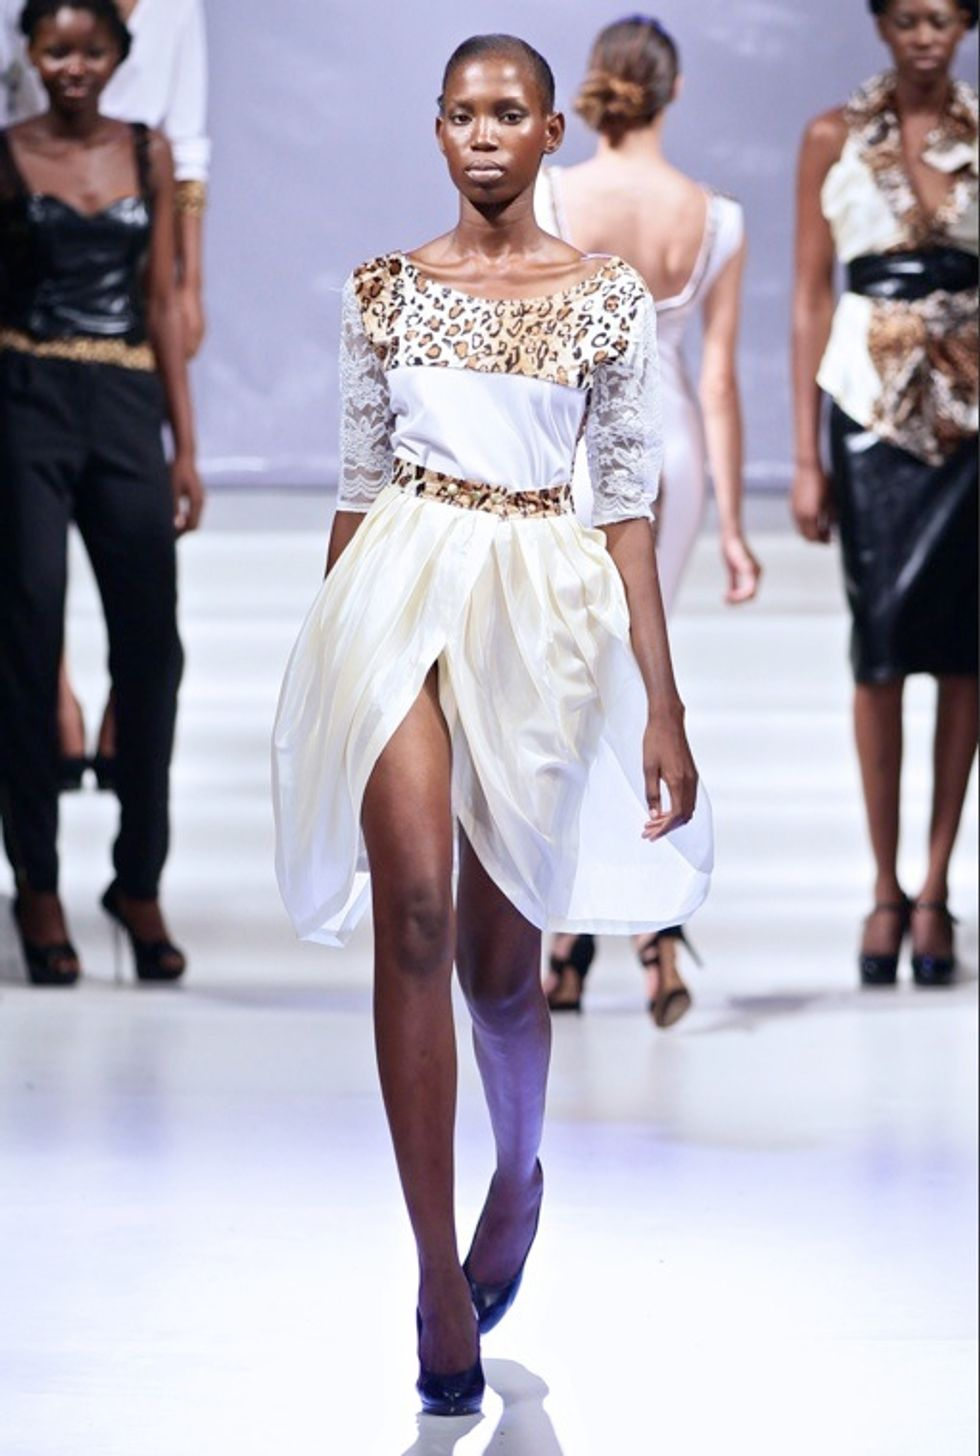 Pret A Poundo Mozambique Fashion Week S Young Designers Day 1 Okayafrica